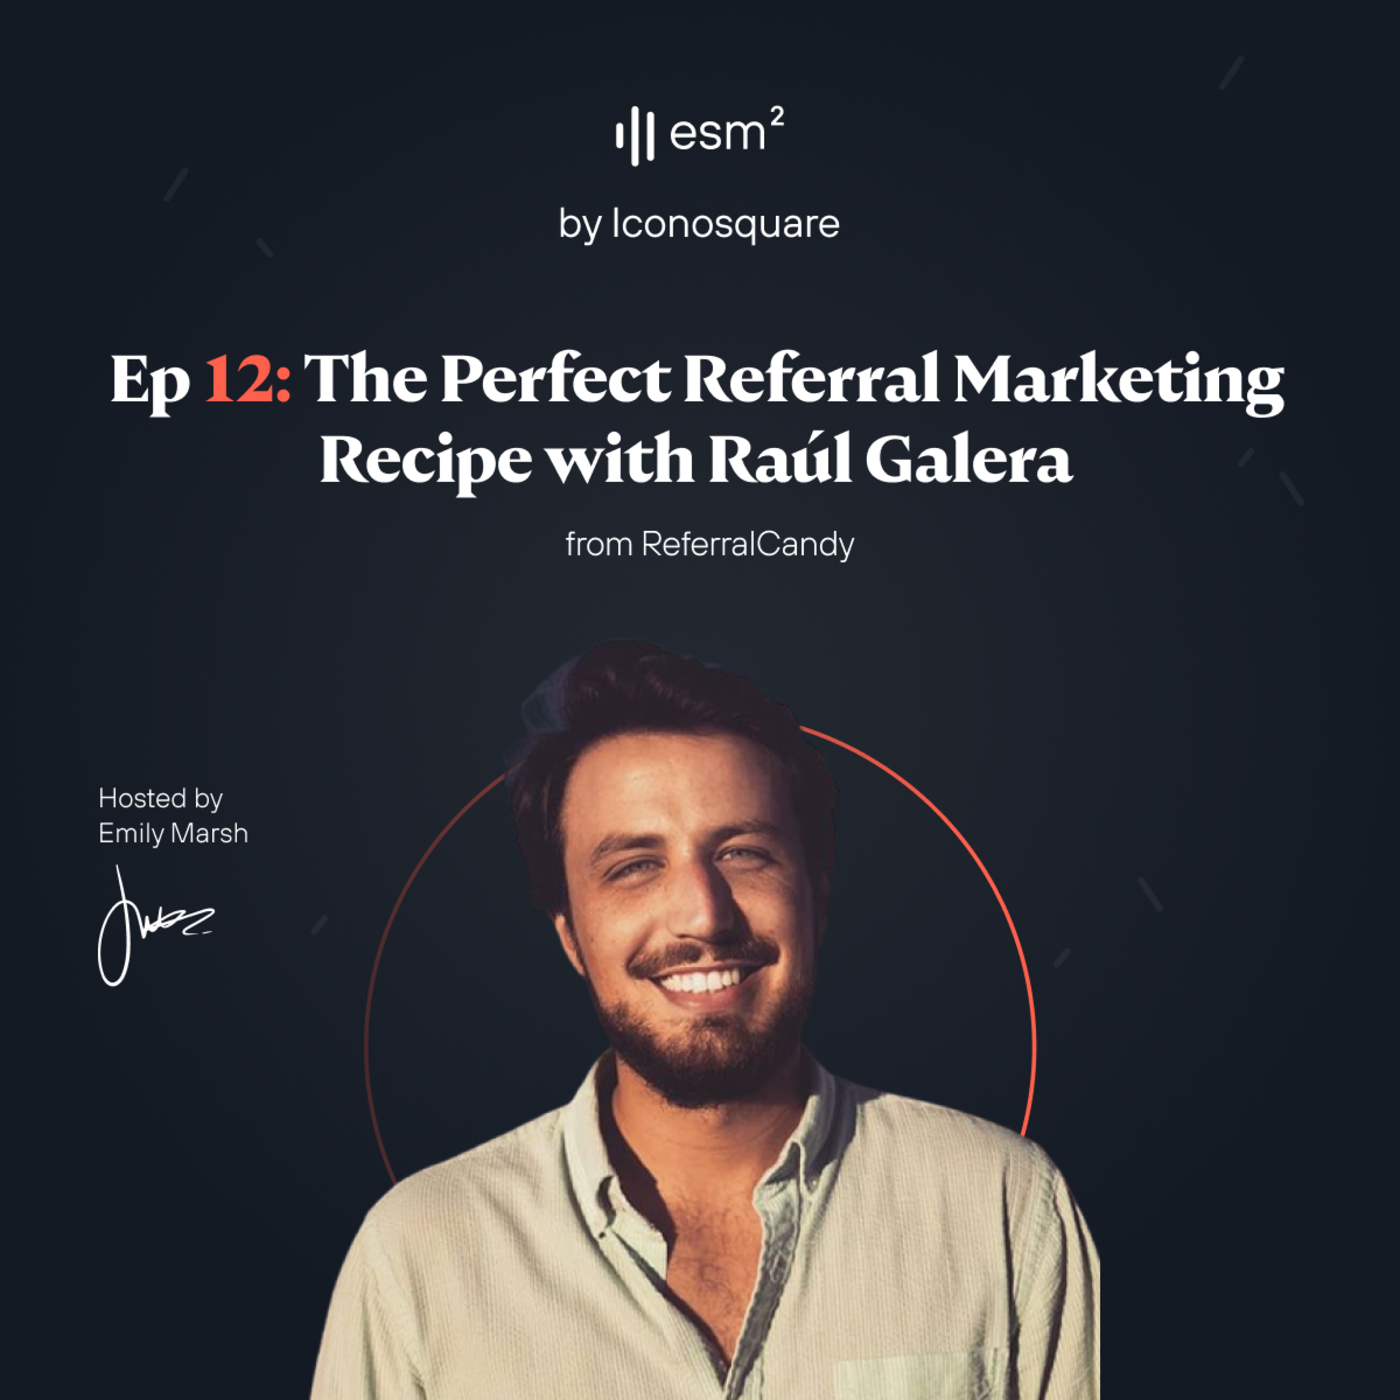 """The Perfect Referral Marketing Recipe"" - Raúl Galera from ReferralCandy"